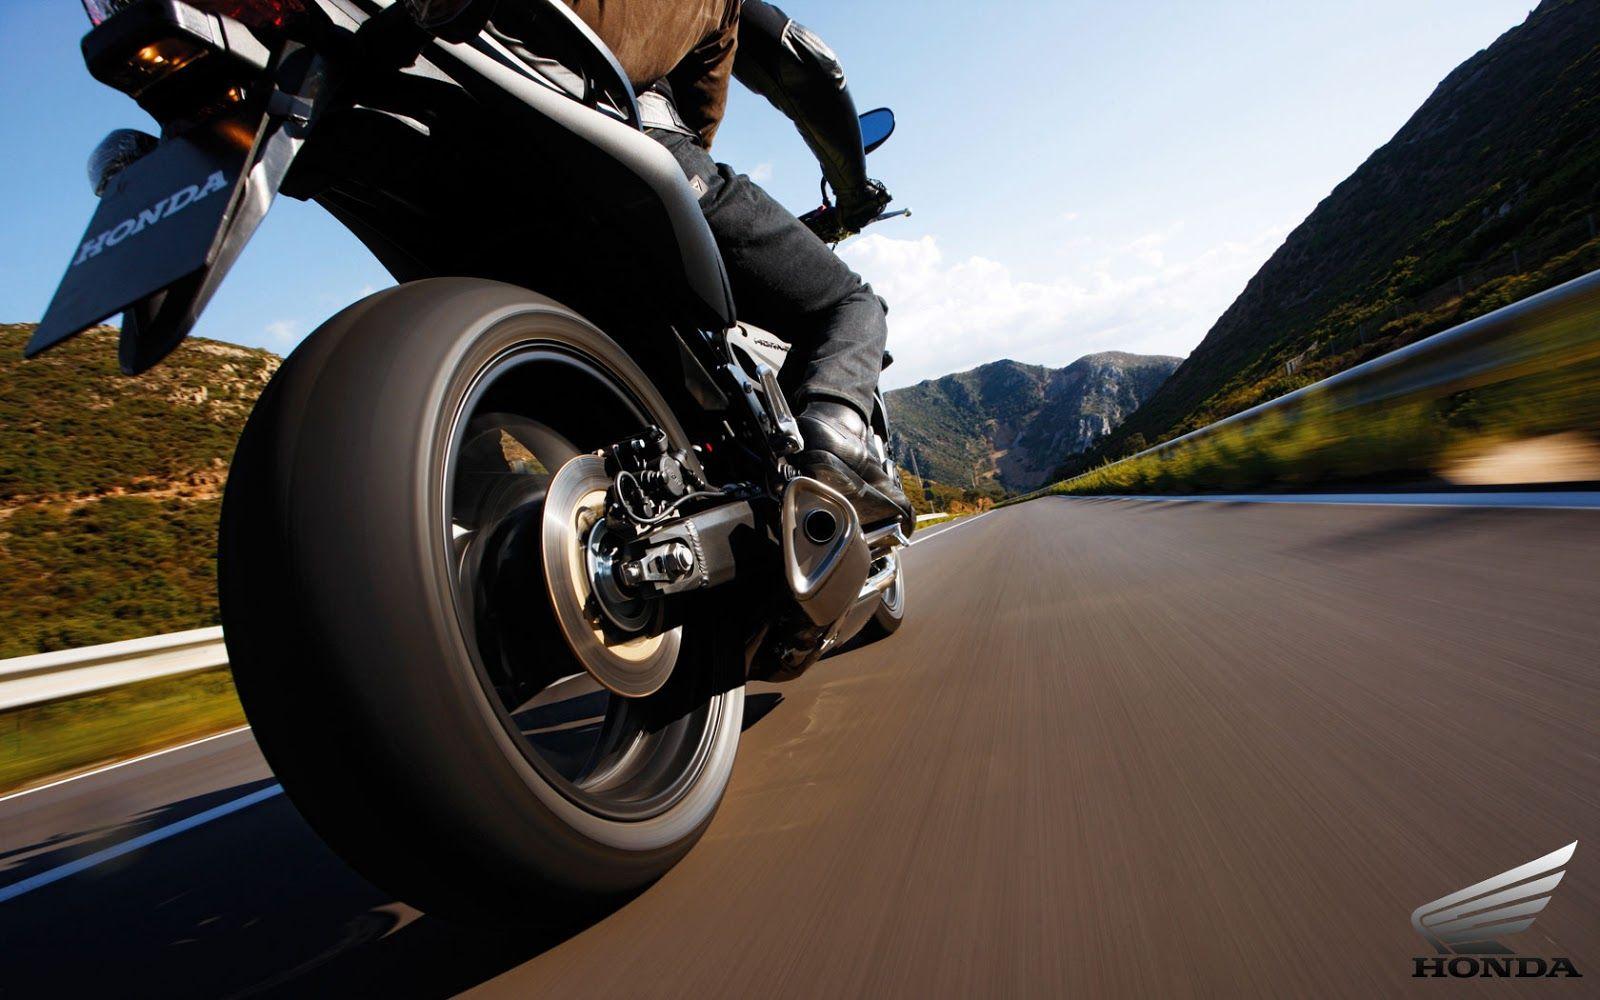 Motos Wallpapers Honda Cb 600f Hornet Wallpapers Honda Hornet Motorcycle